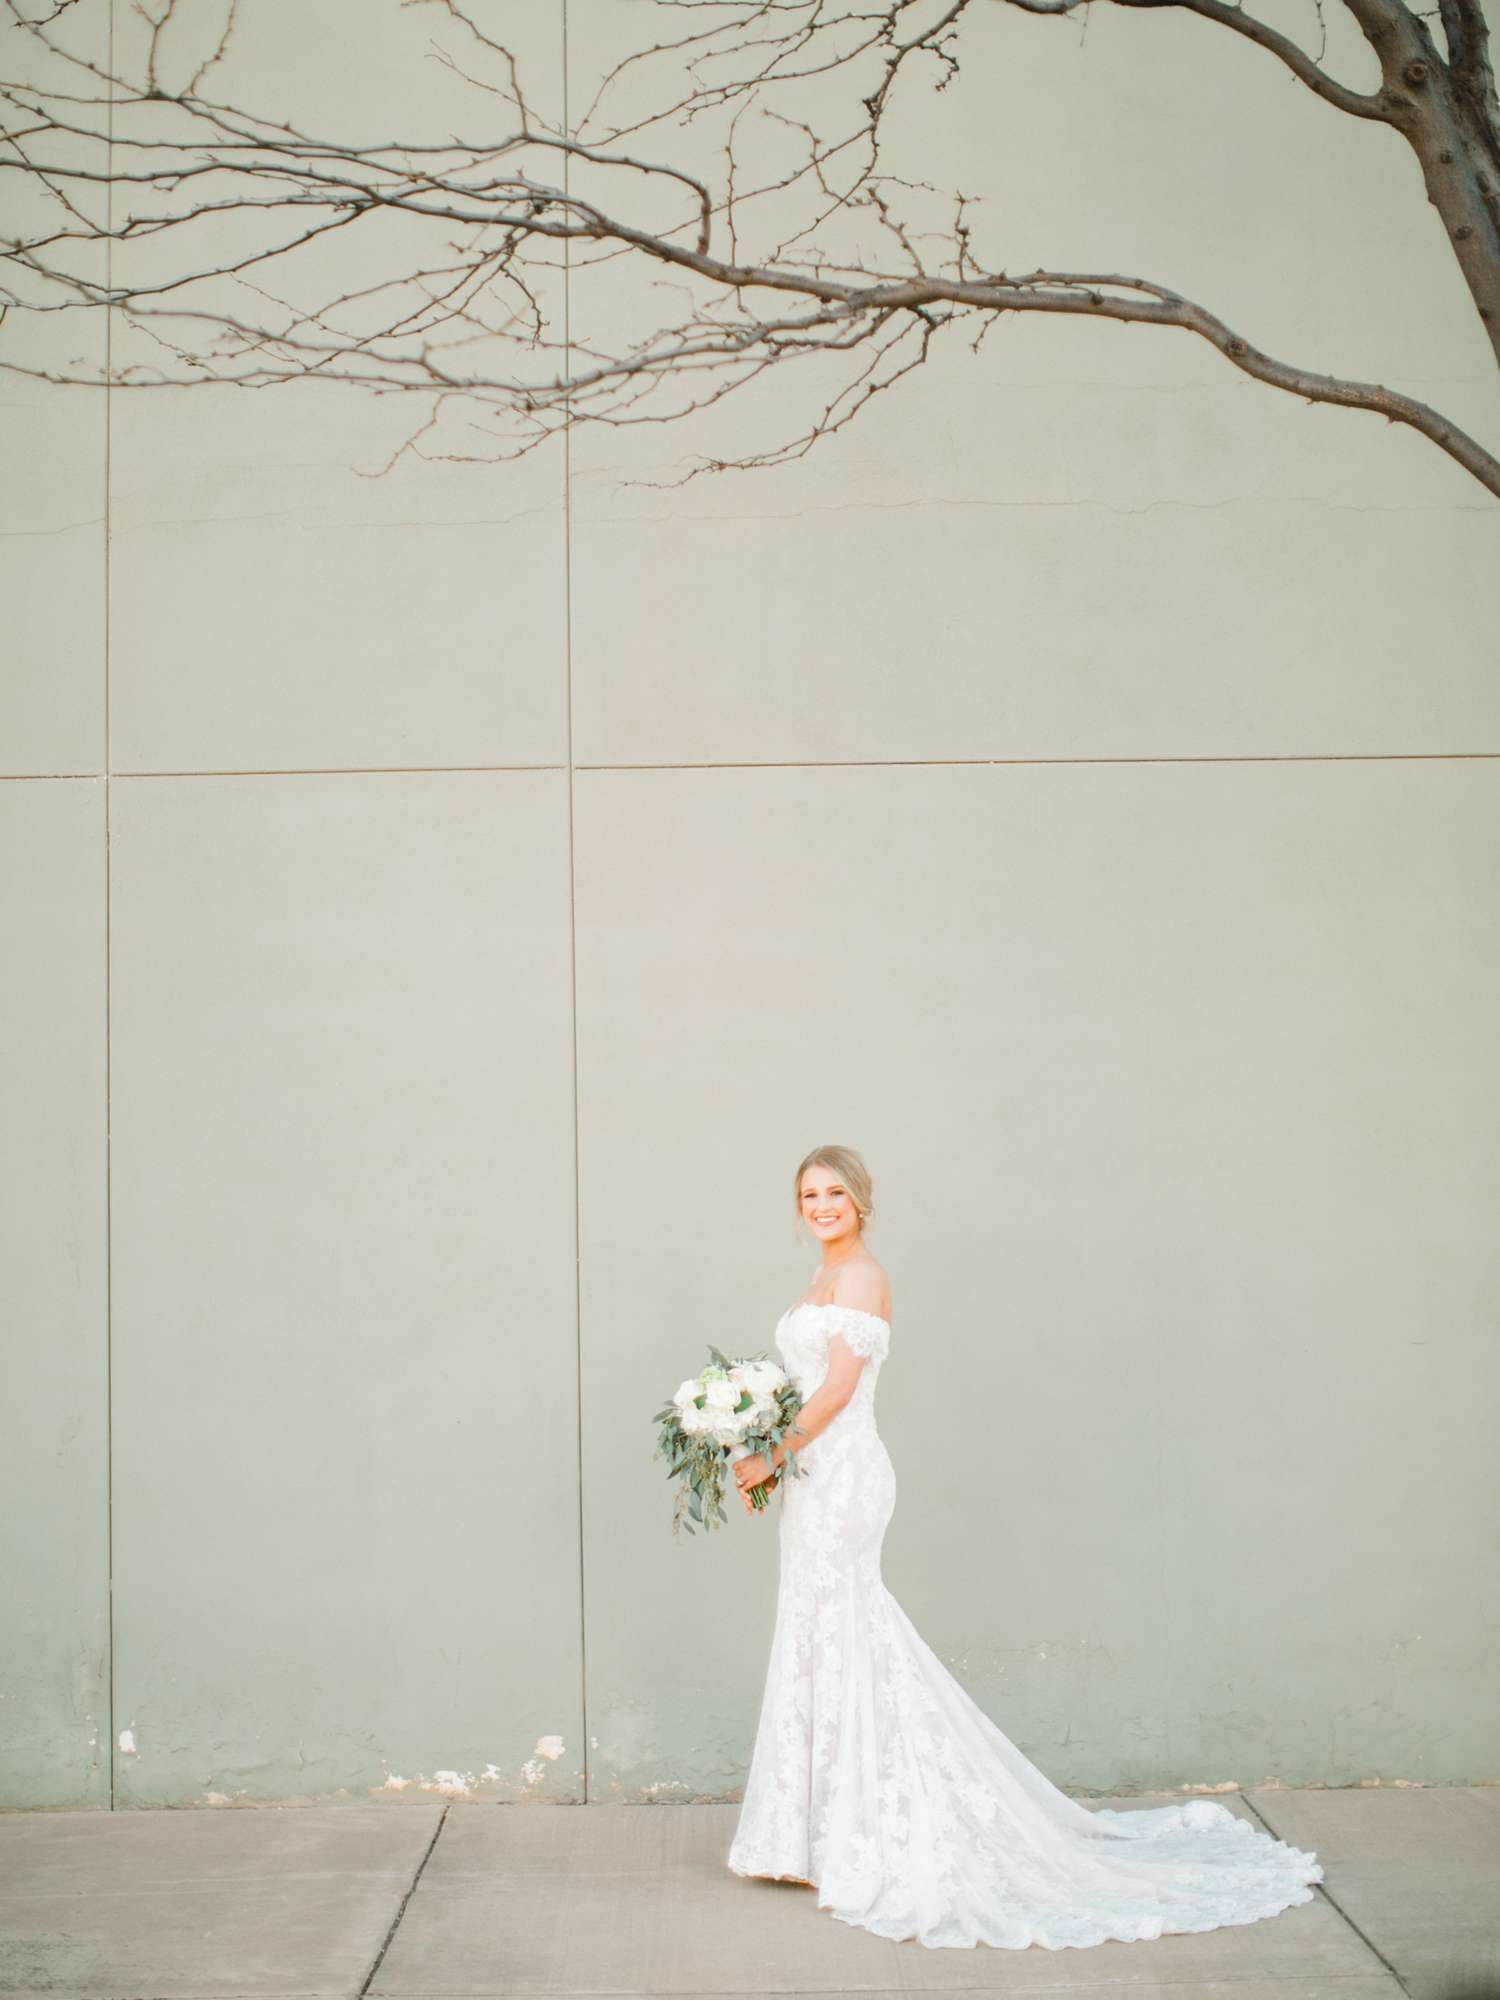 MORGAN+BOONE+BRIDALS+WEDDING+PHOTOGRAPHER_0033.jpg